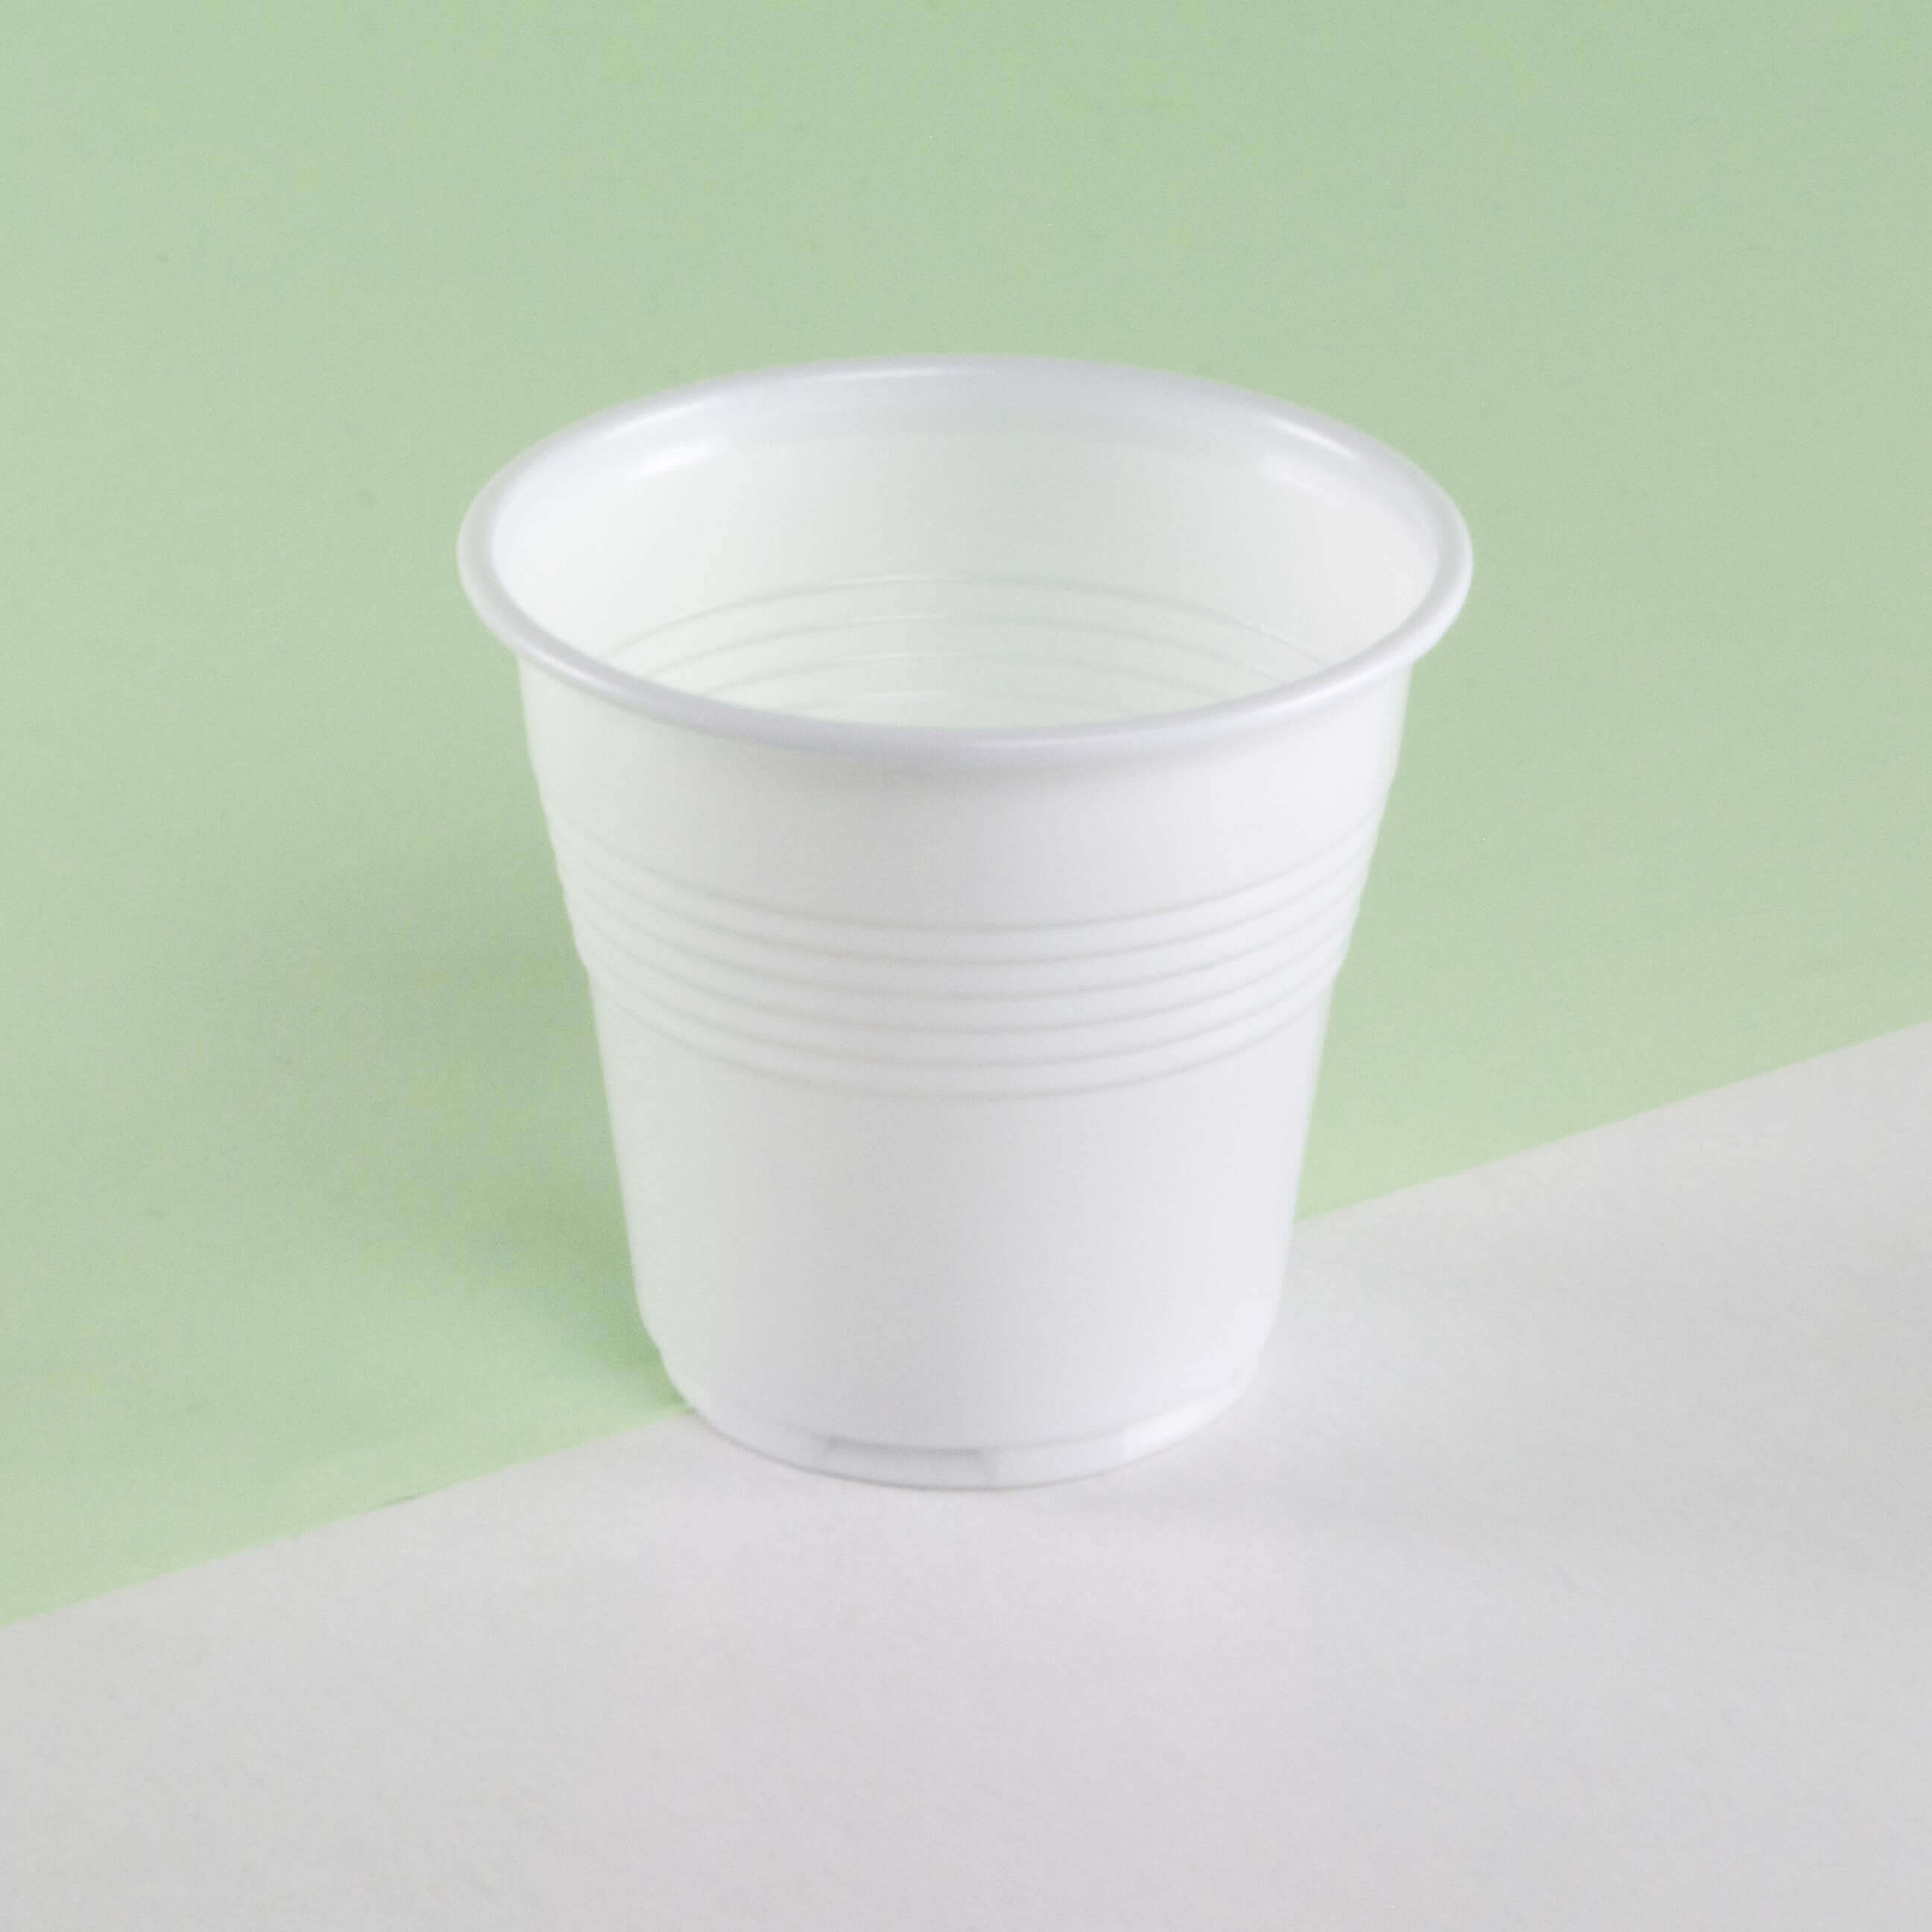 Bicchieri bianchi caff 80 cc neutri for Bicchieri caffe